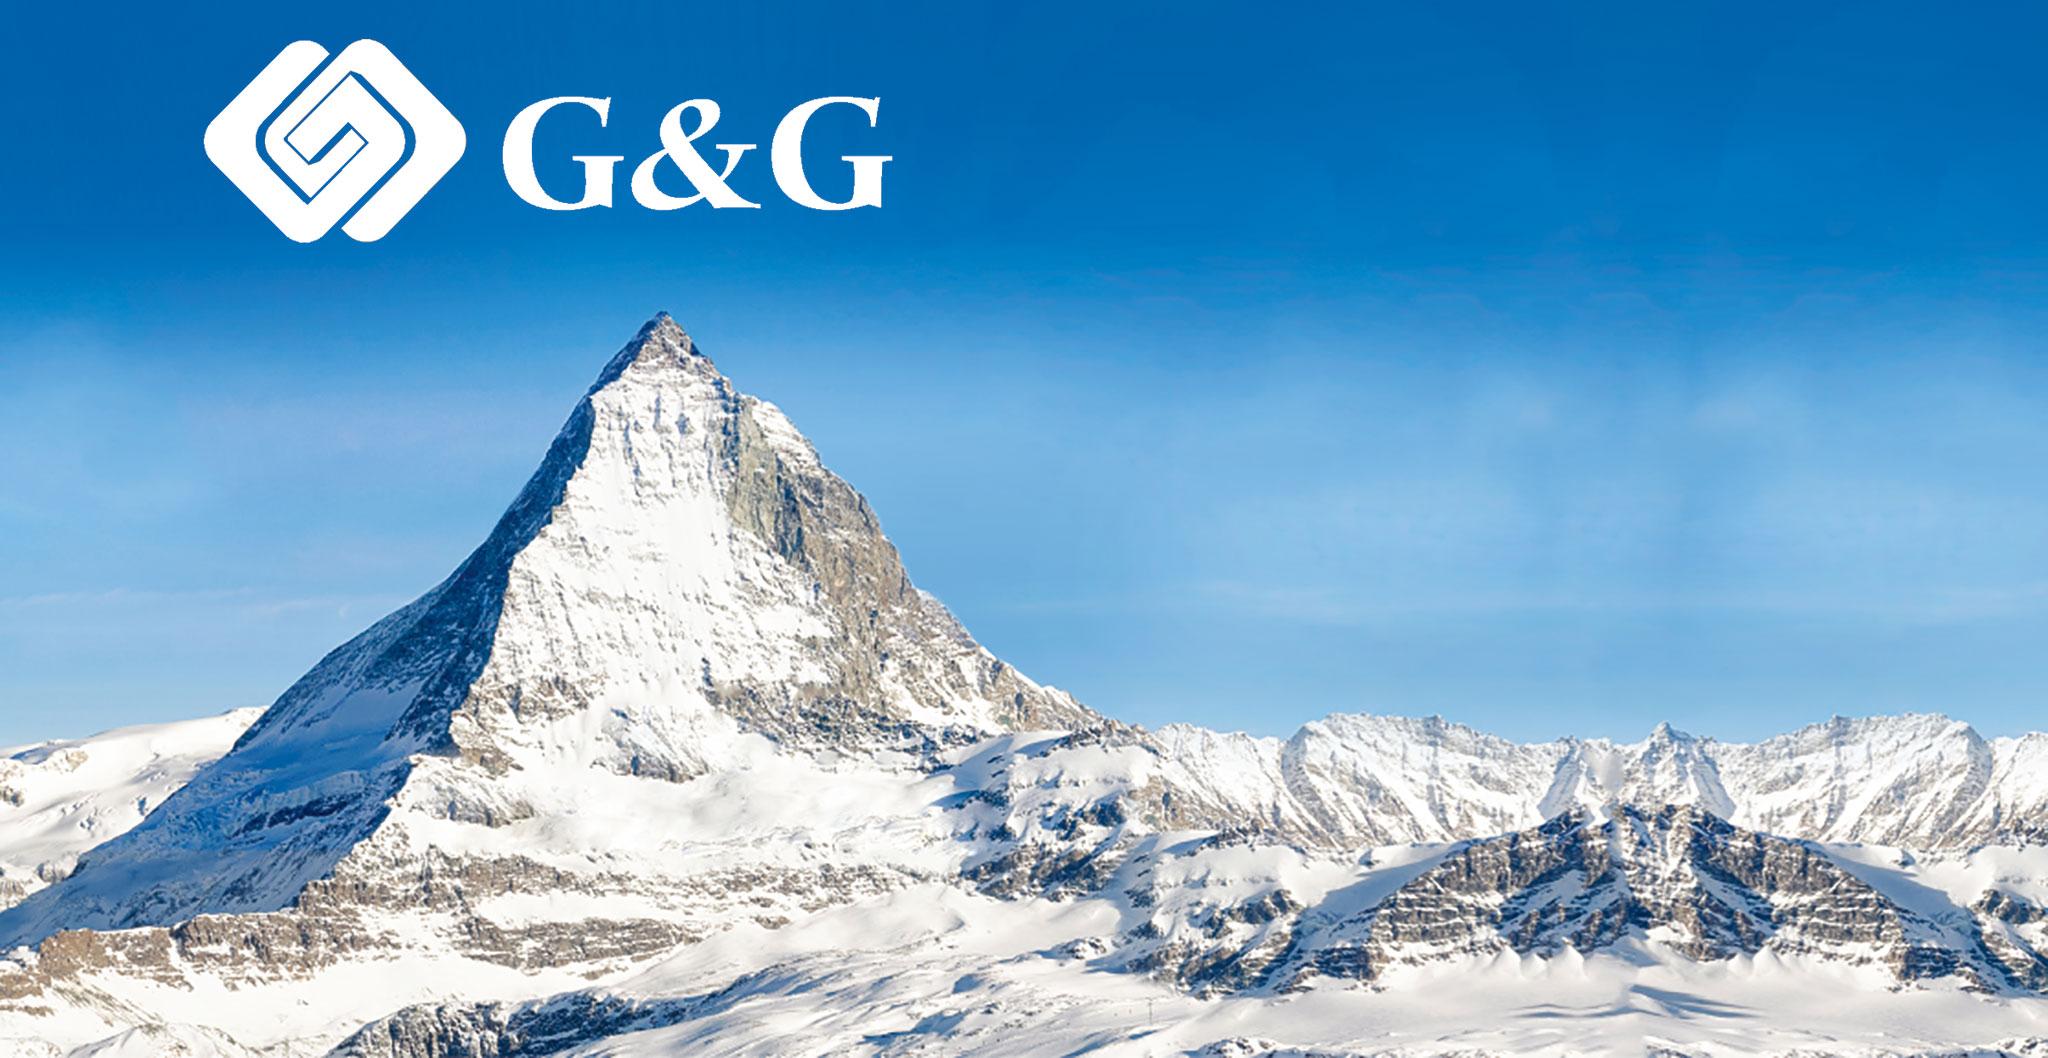 G&G Image Premium Tinte, Toner, Schriftbänder